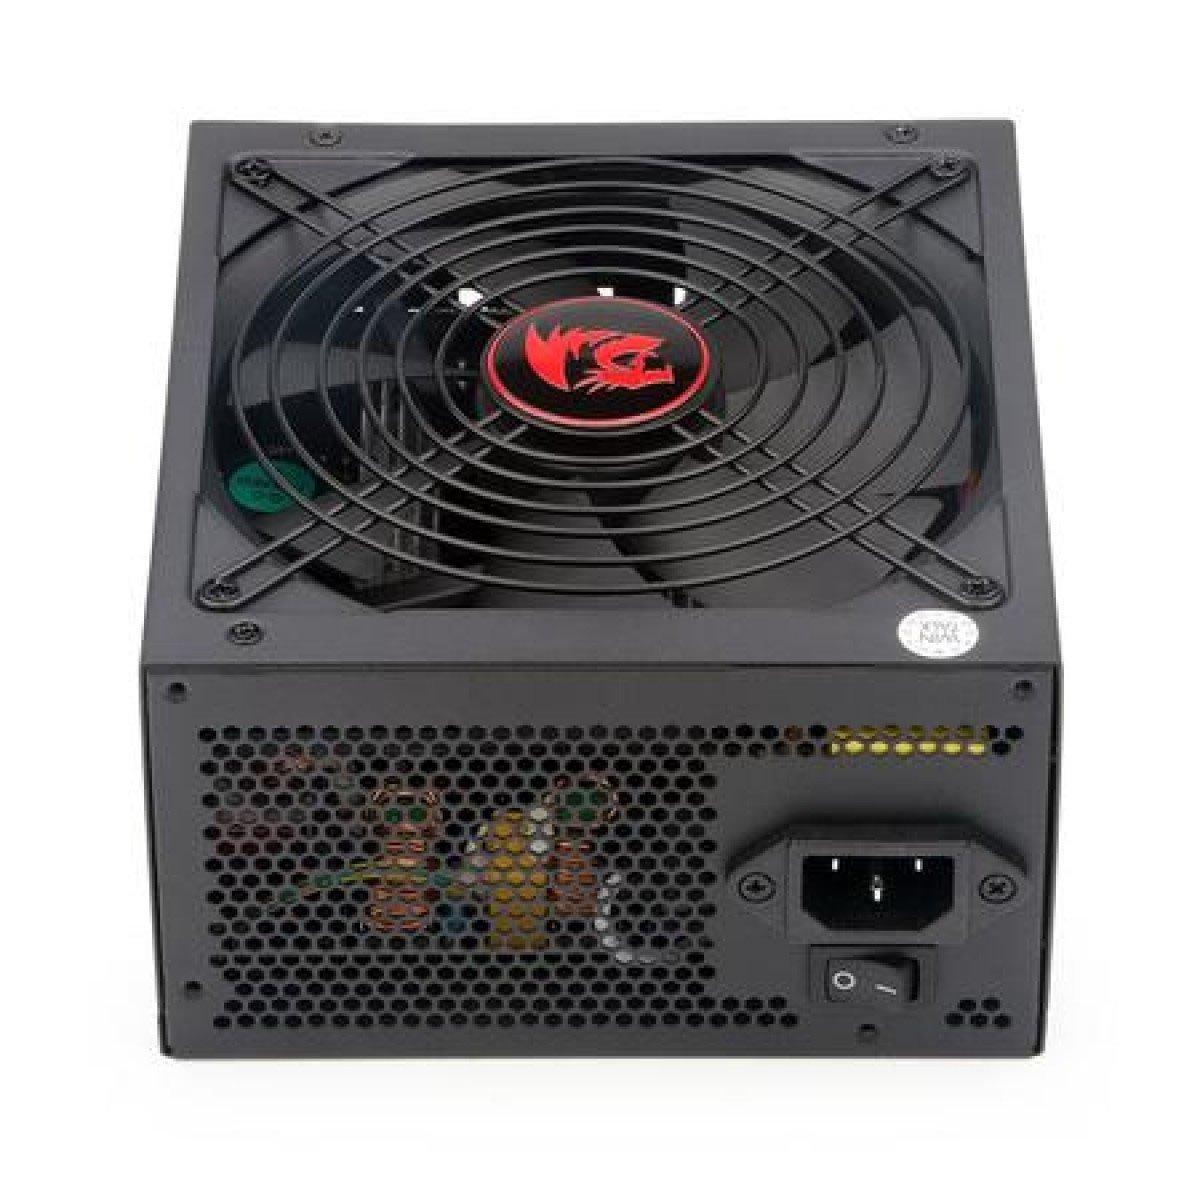 fonte atx gamer 600w redragon gc ps003 bronze modular 80 plus 50738 2000 203132 1